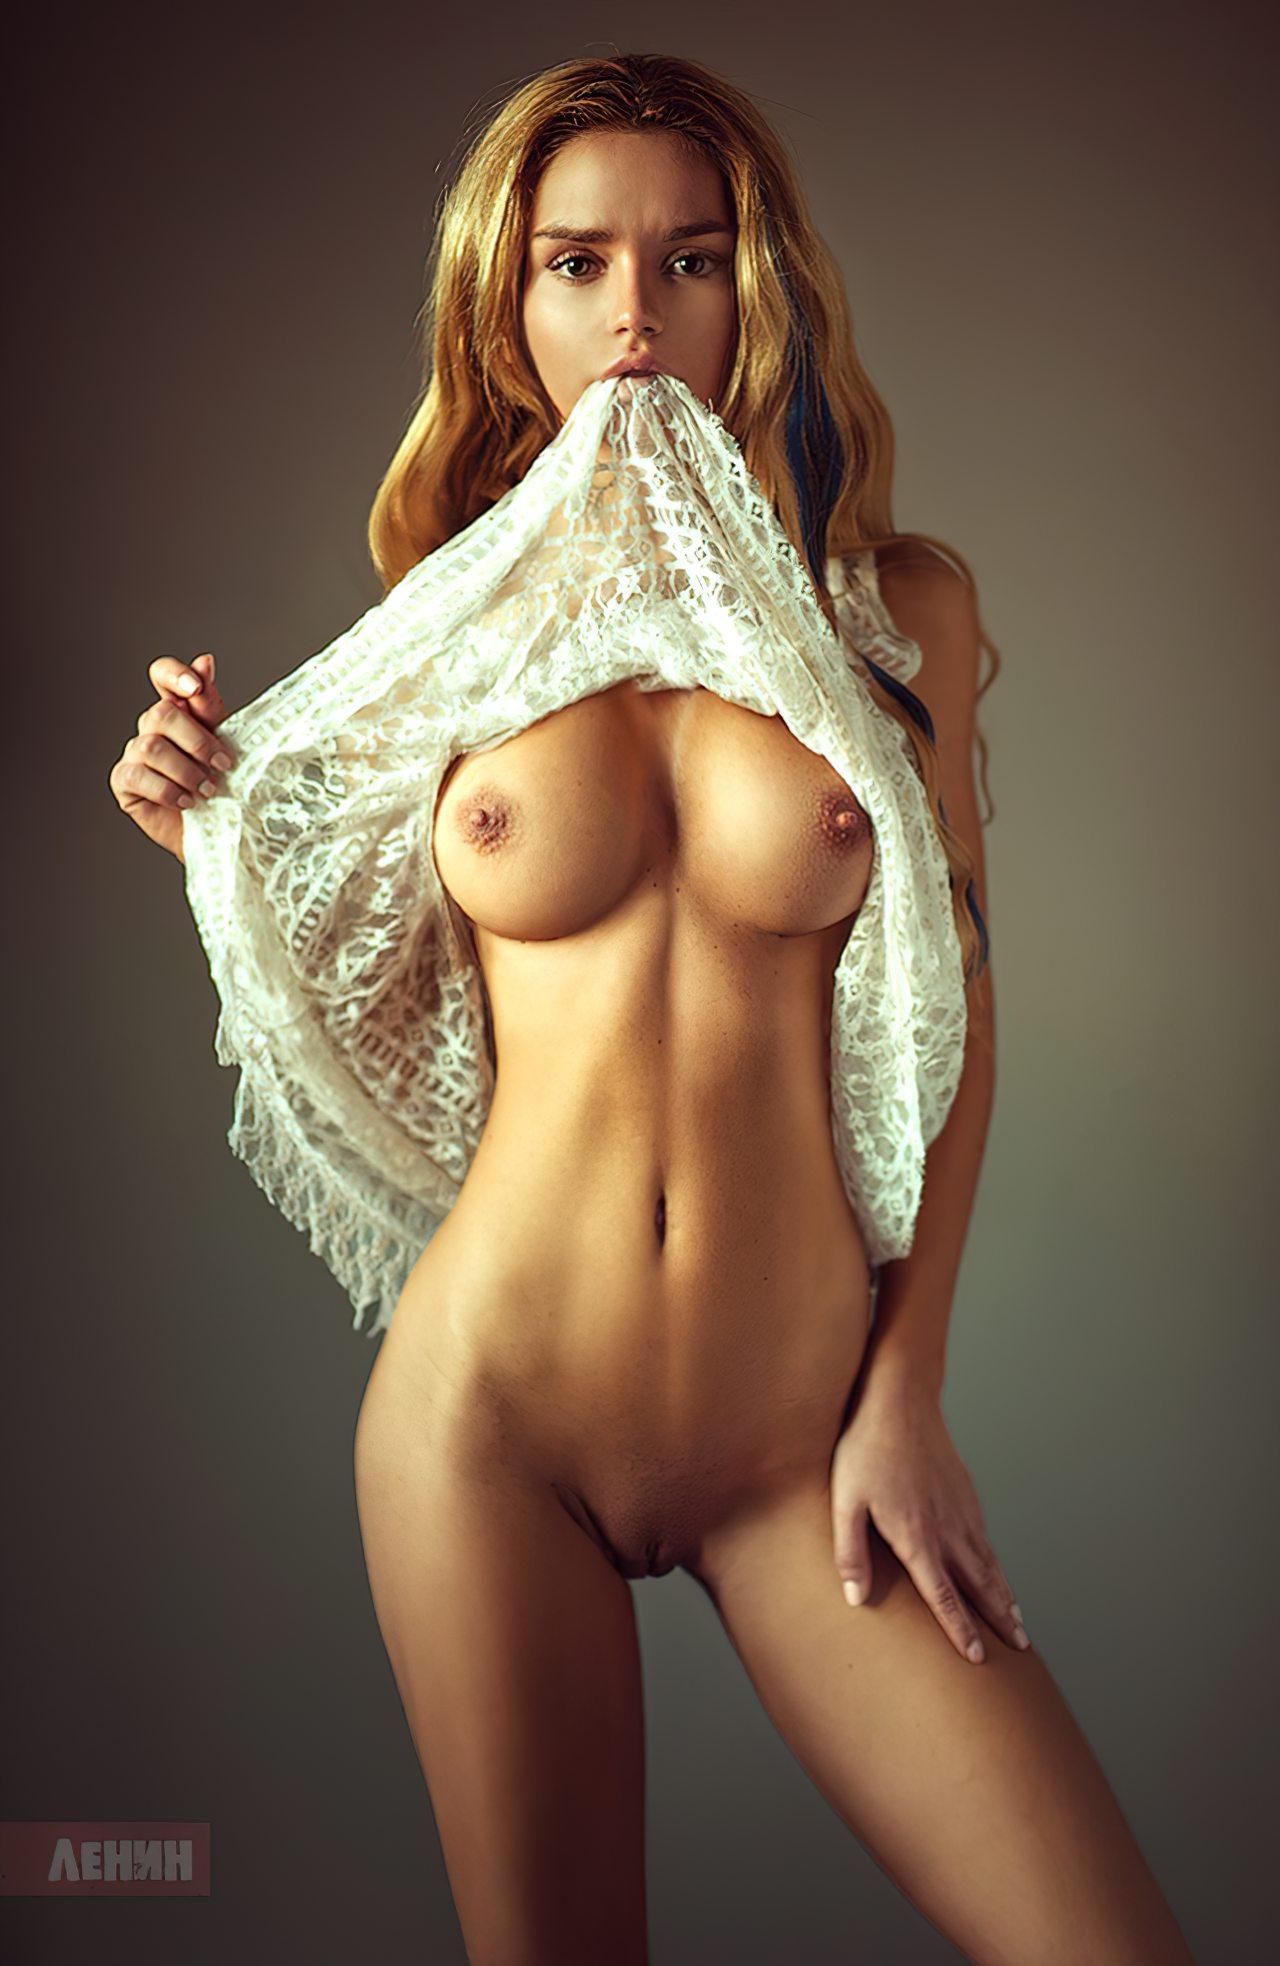 Mulher Gostosa (35)